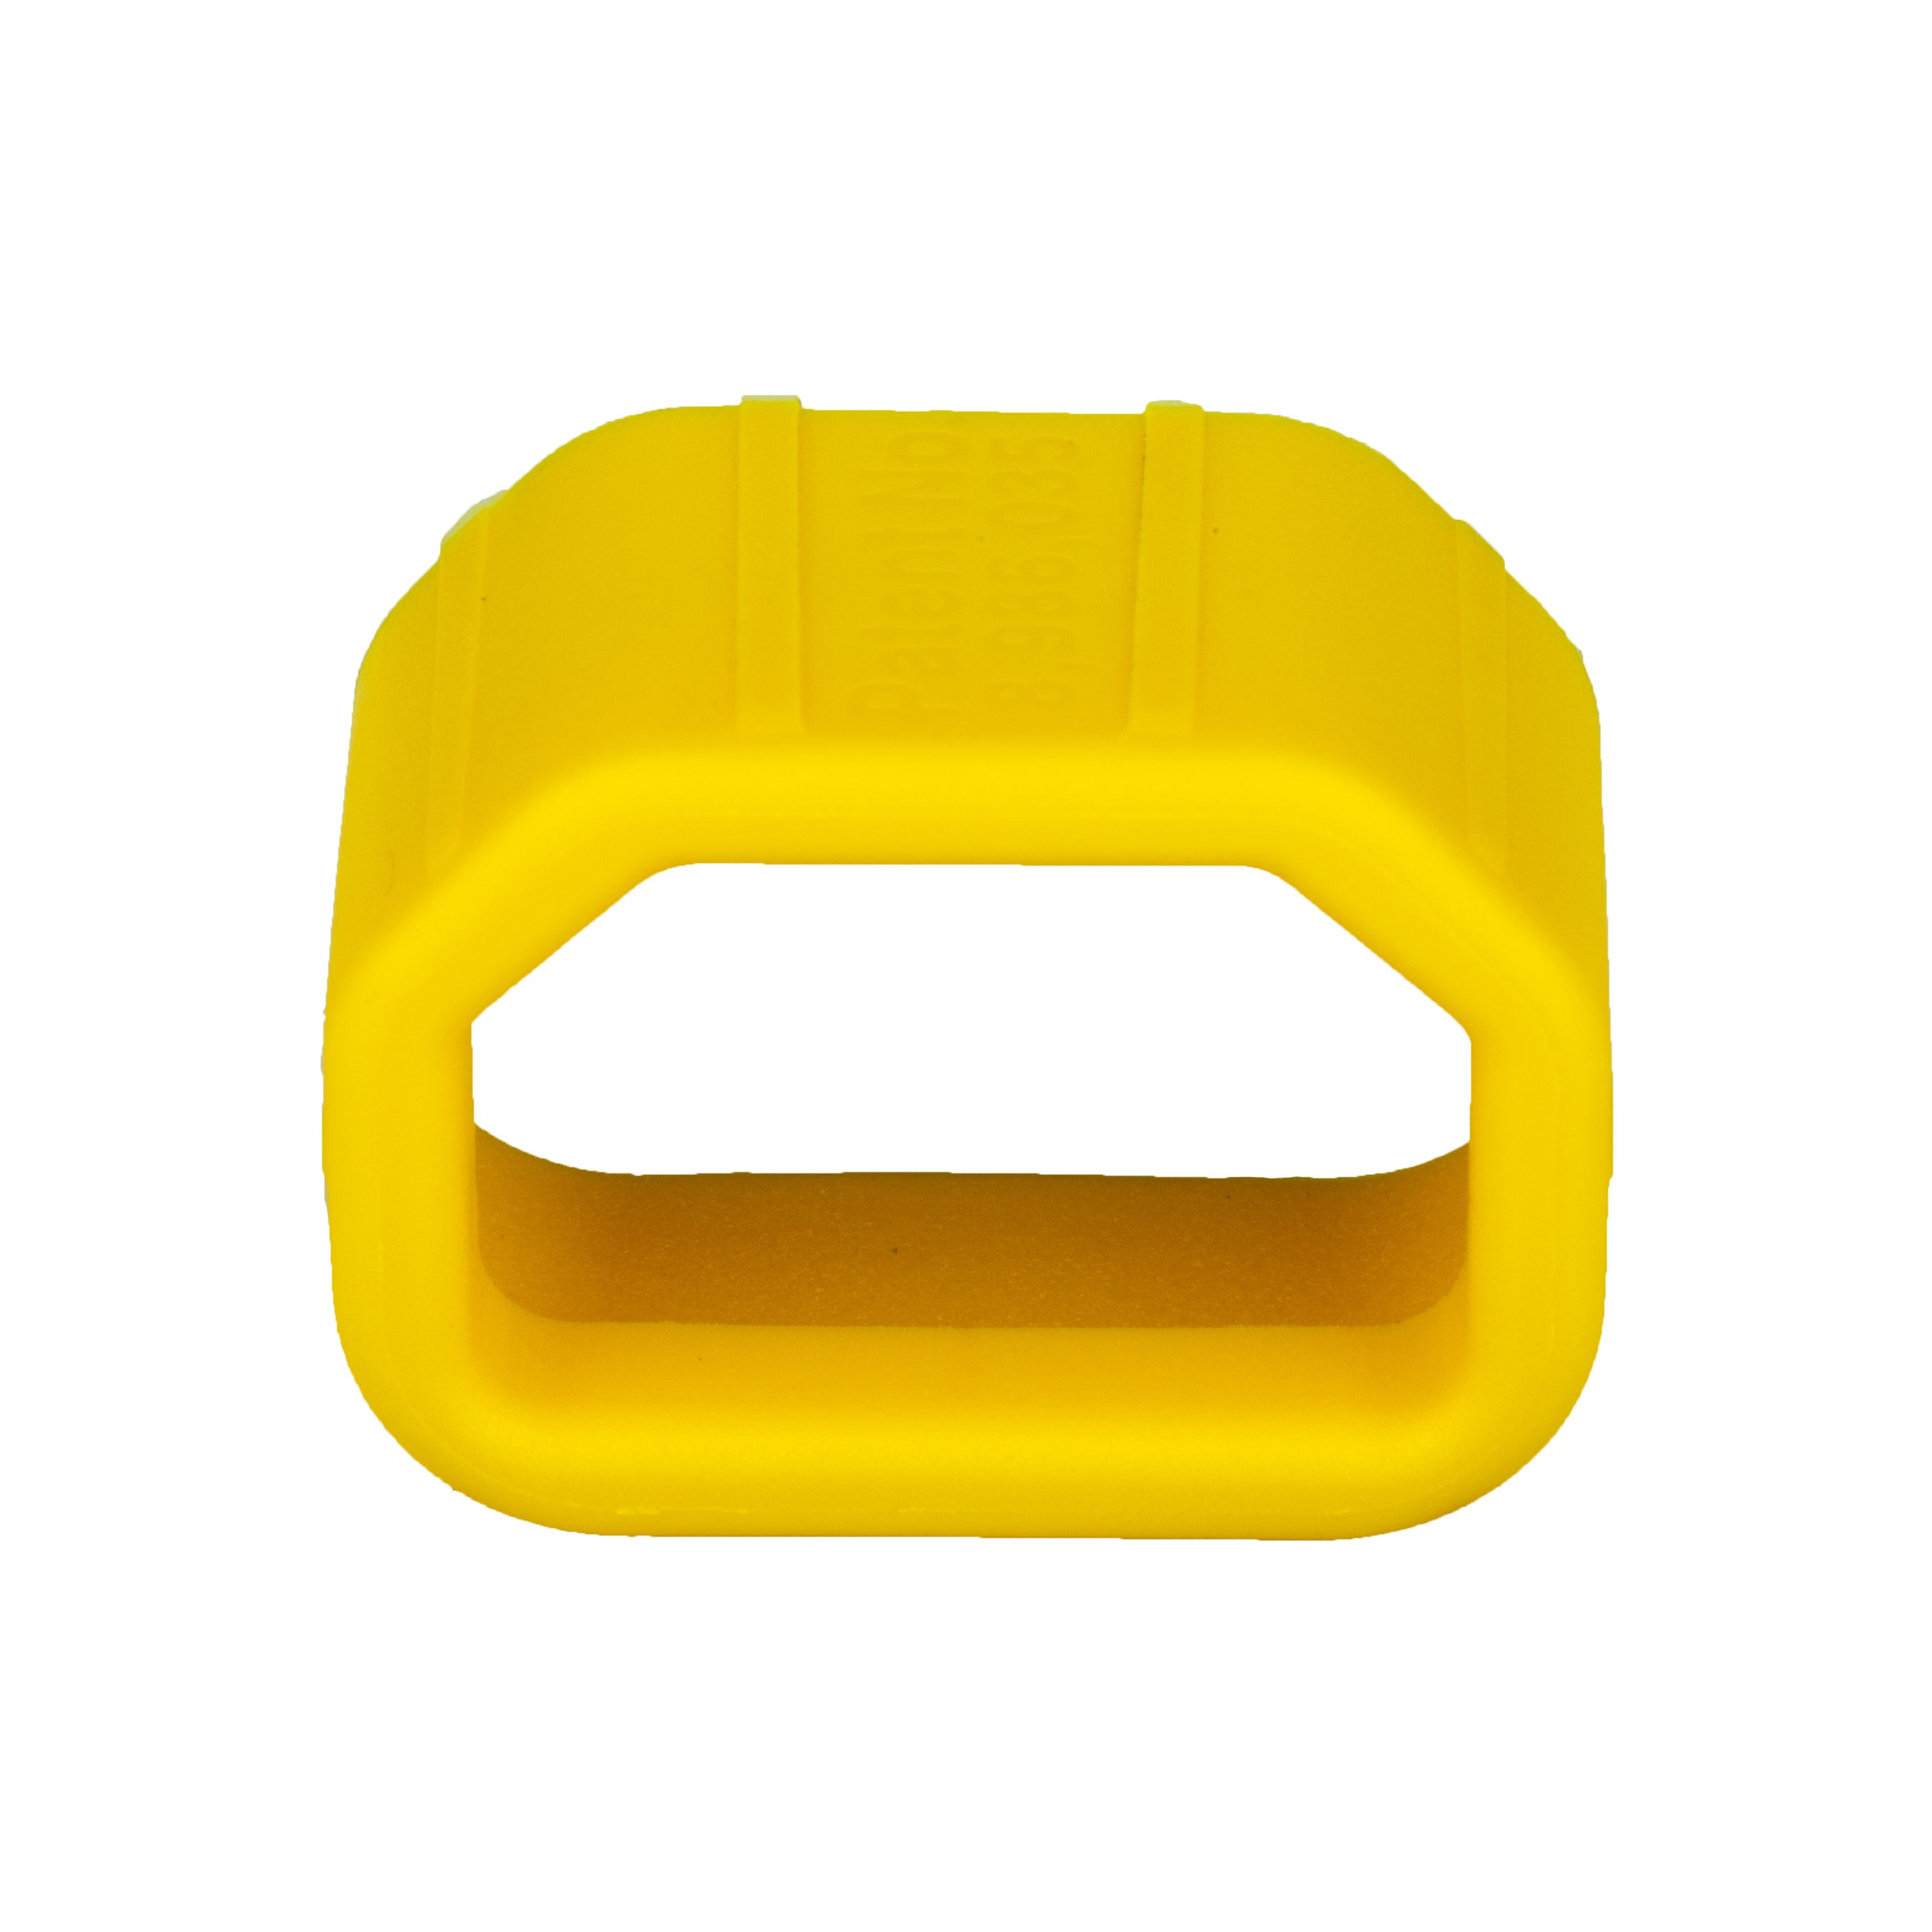 IEC 60320 C14 Secure Sleeve